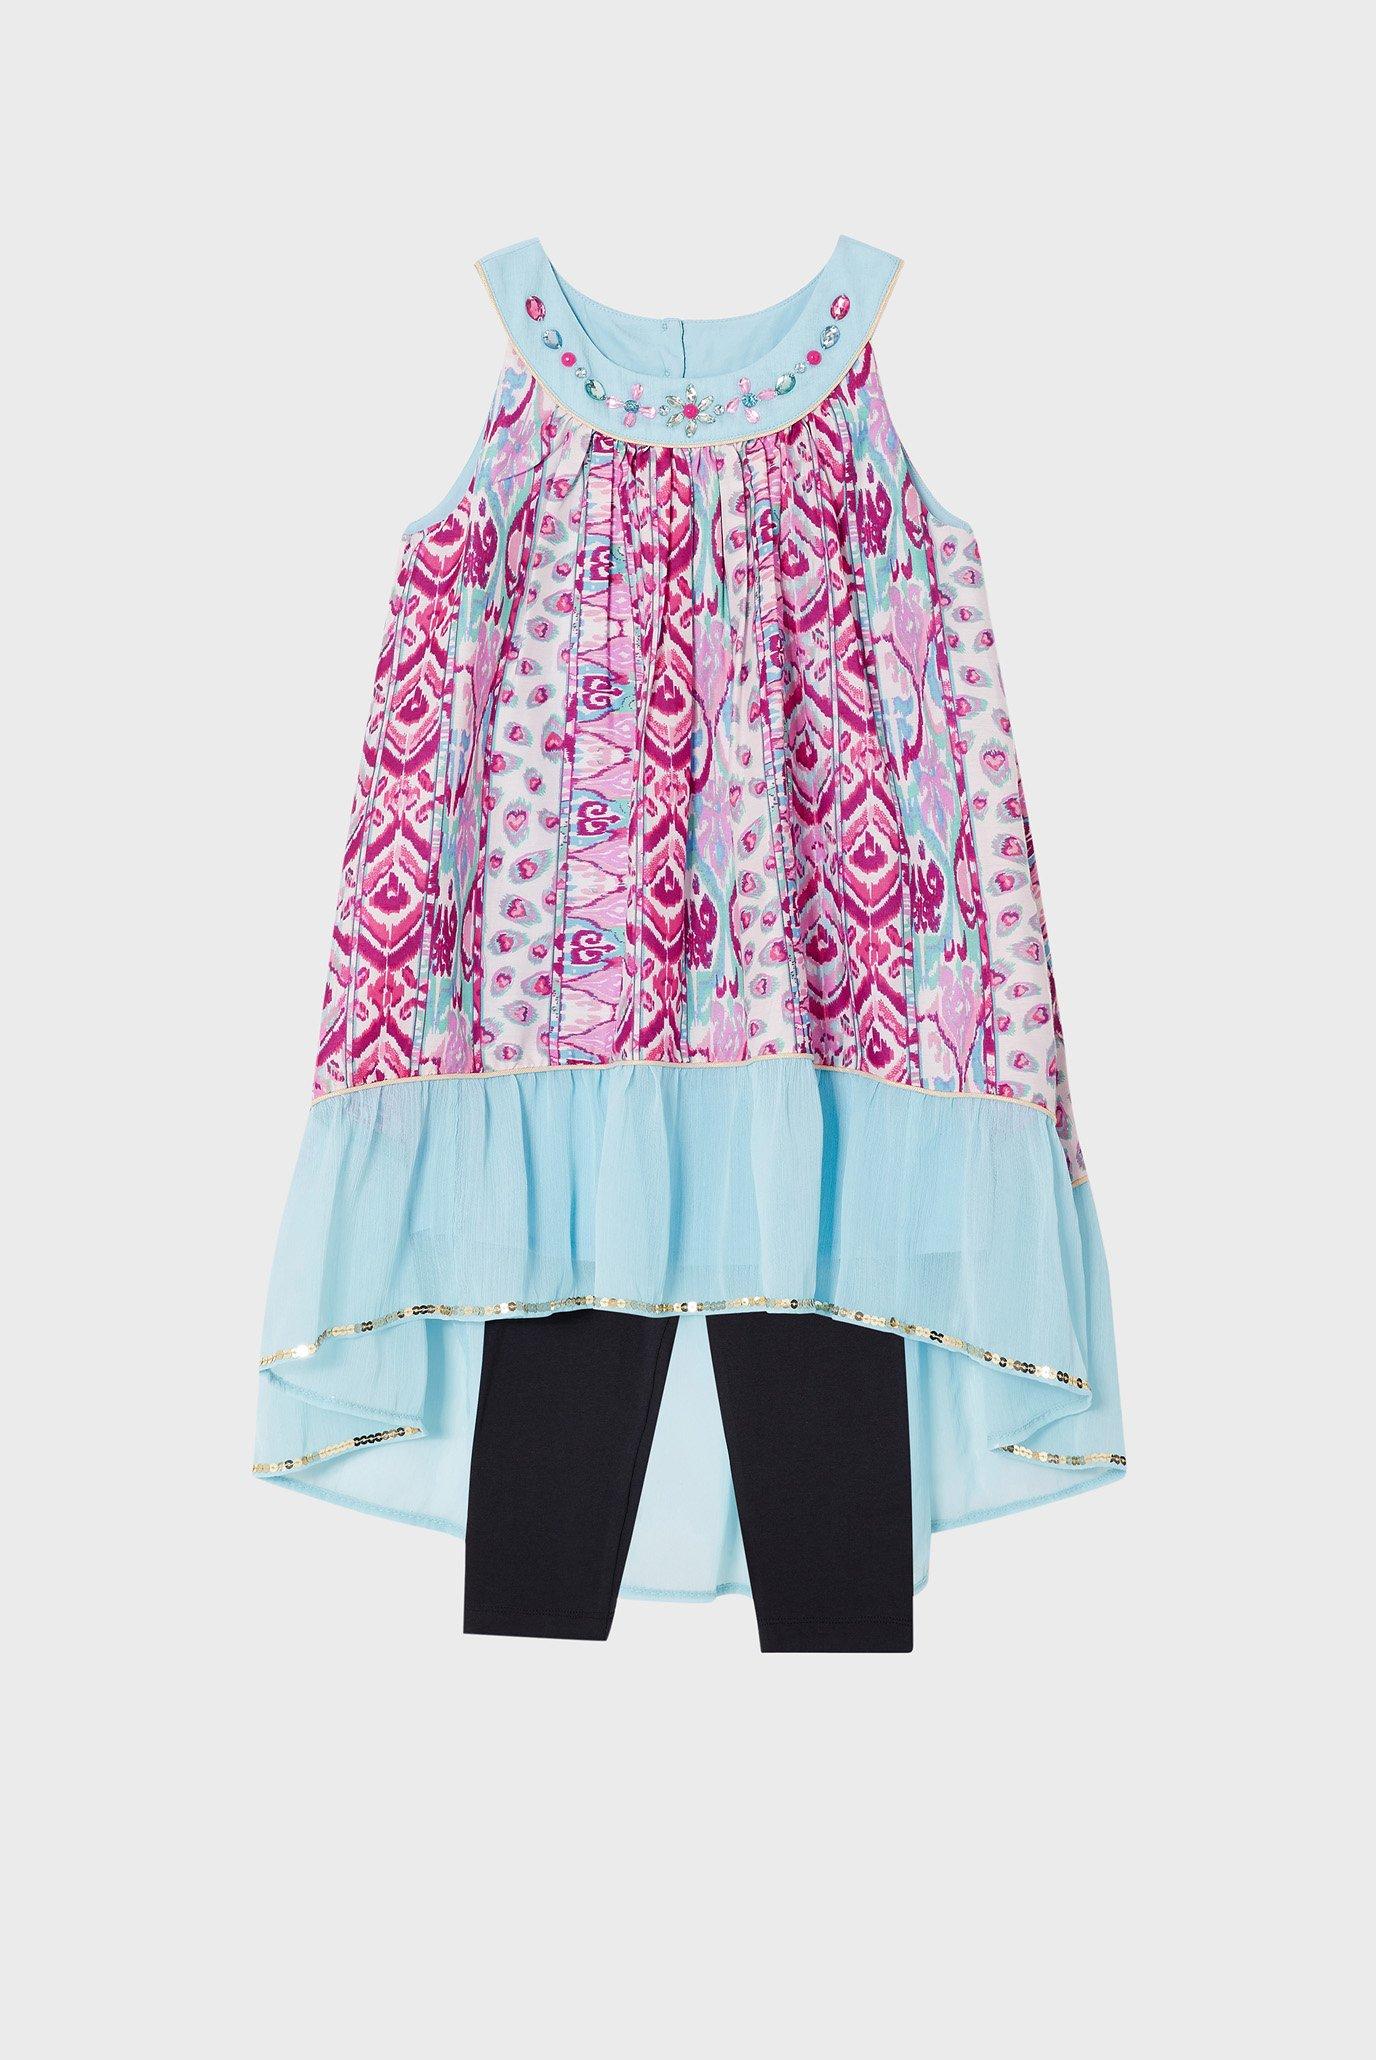 Дитячий комплект одягу (туніка, легінси) AZTEC TUNIC TOP AND 1